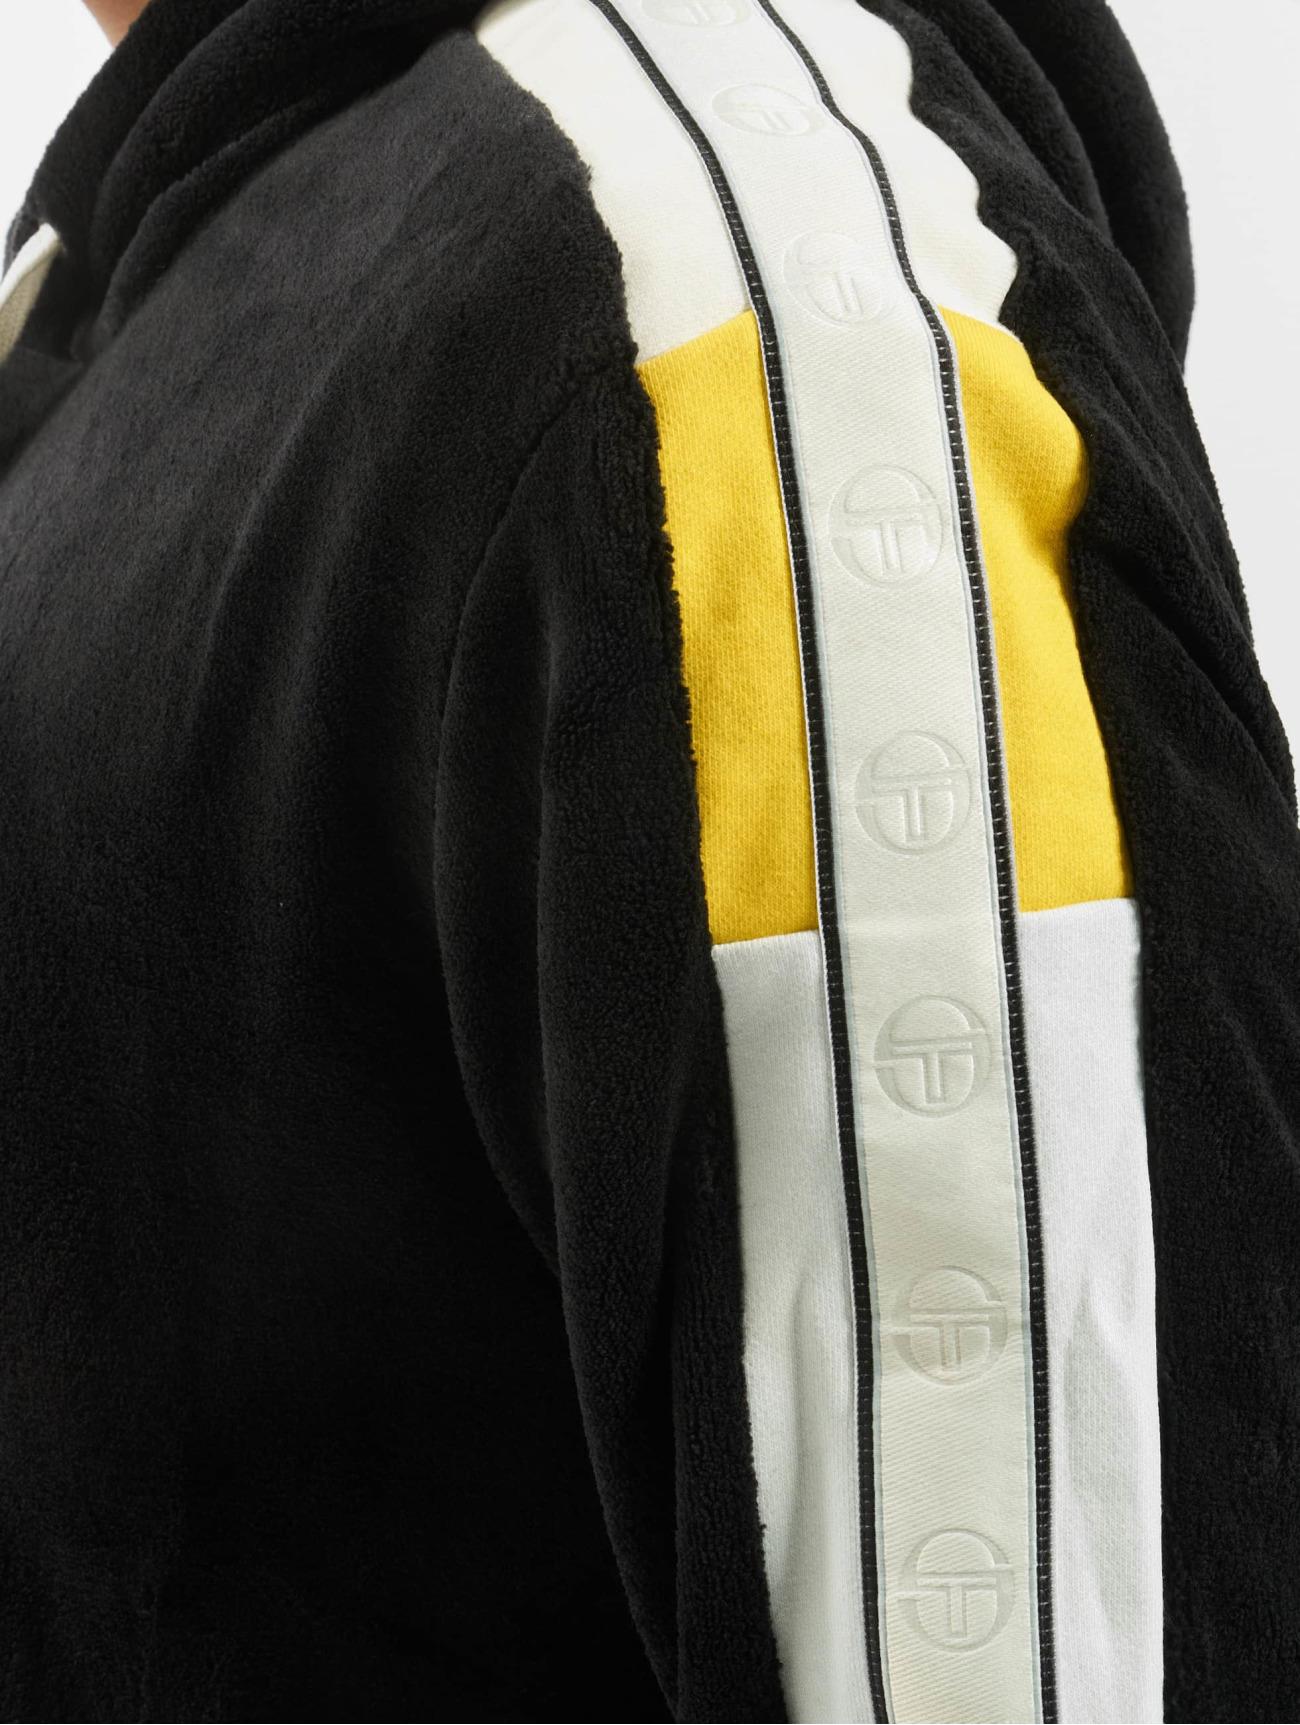 Sergio Tacchini Herren Pullover Dundee  in schwarz 709553